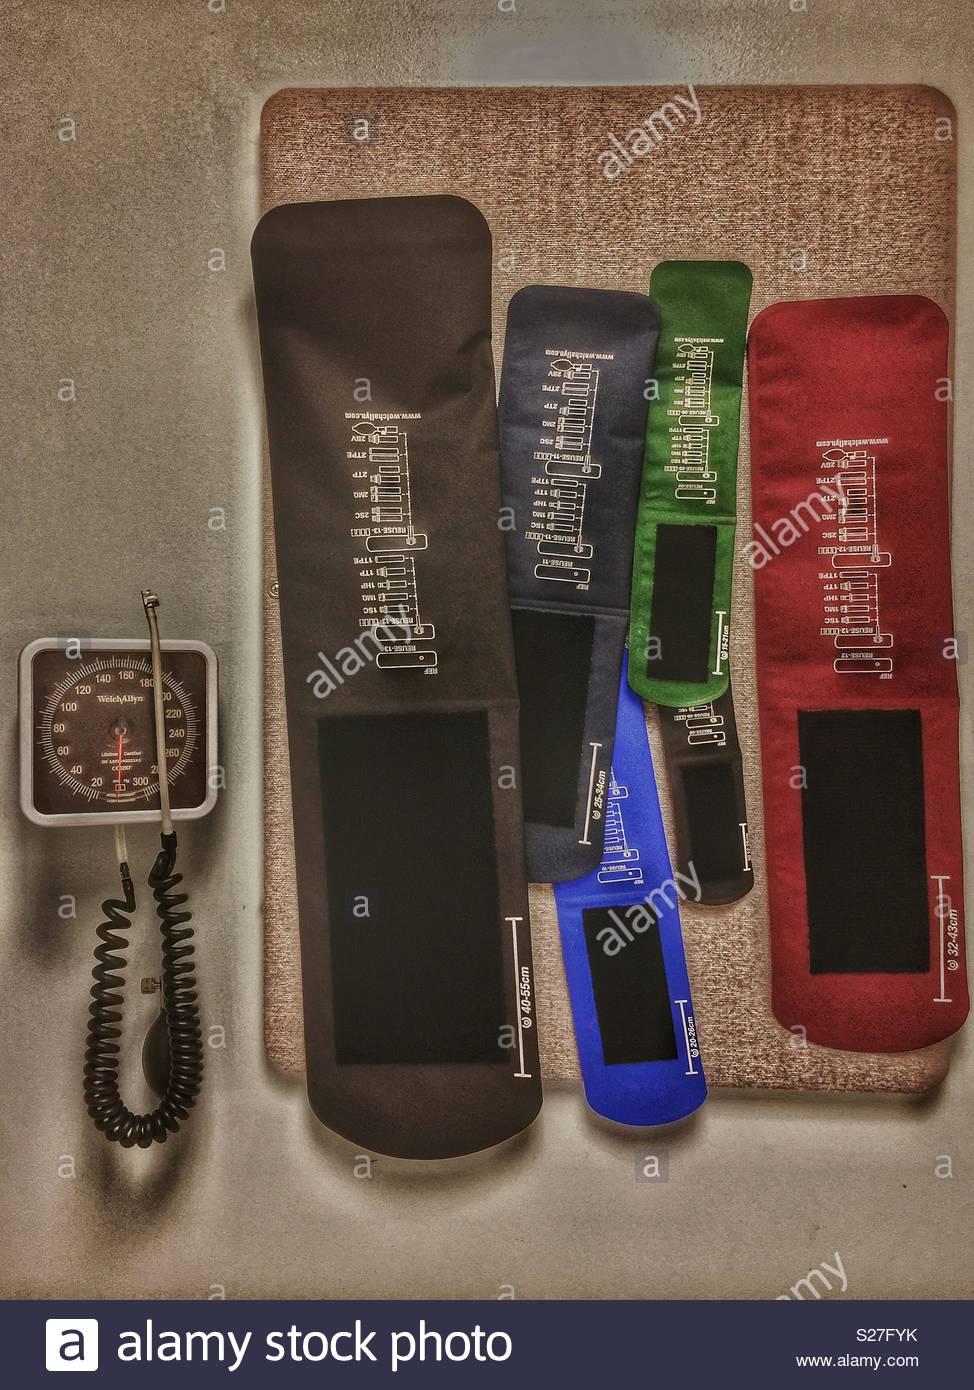 Pediatric blood pressure equipment - Stock Image